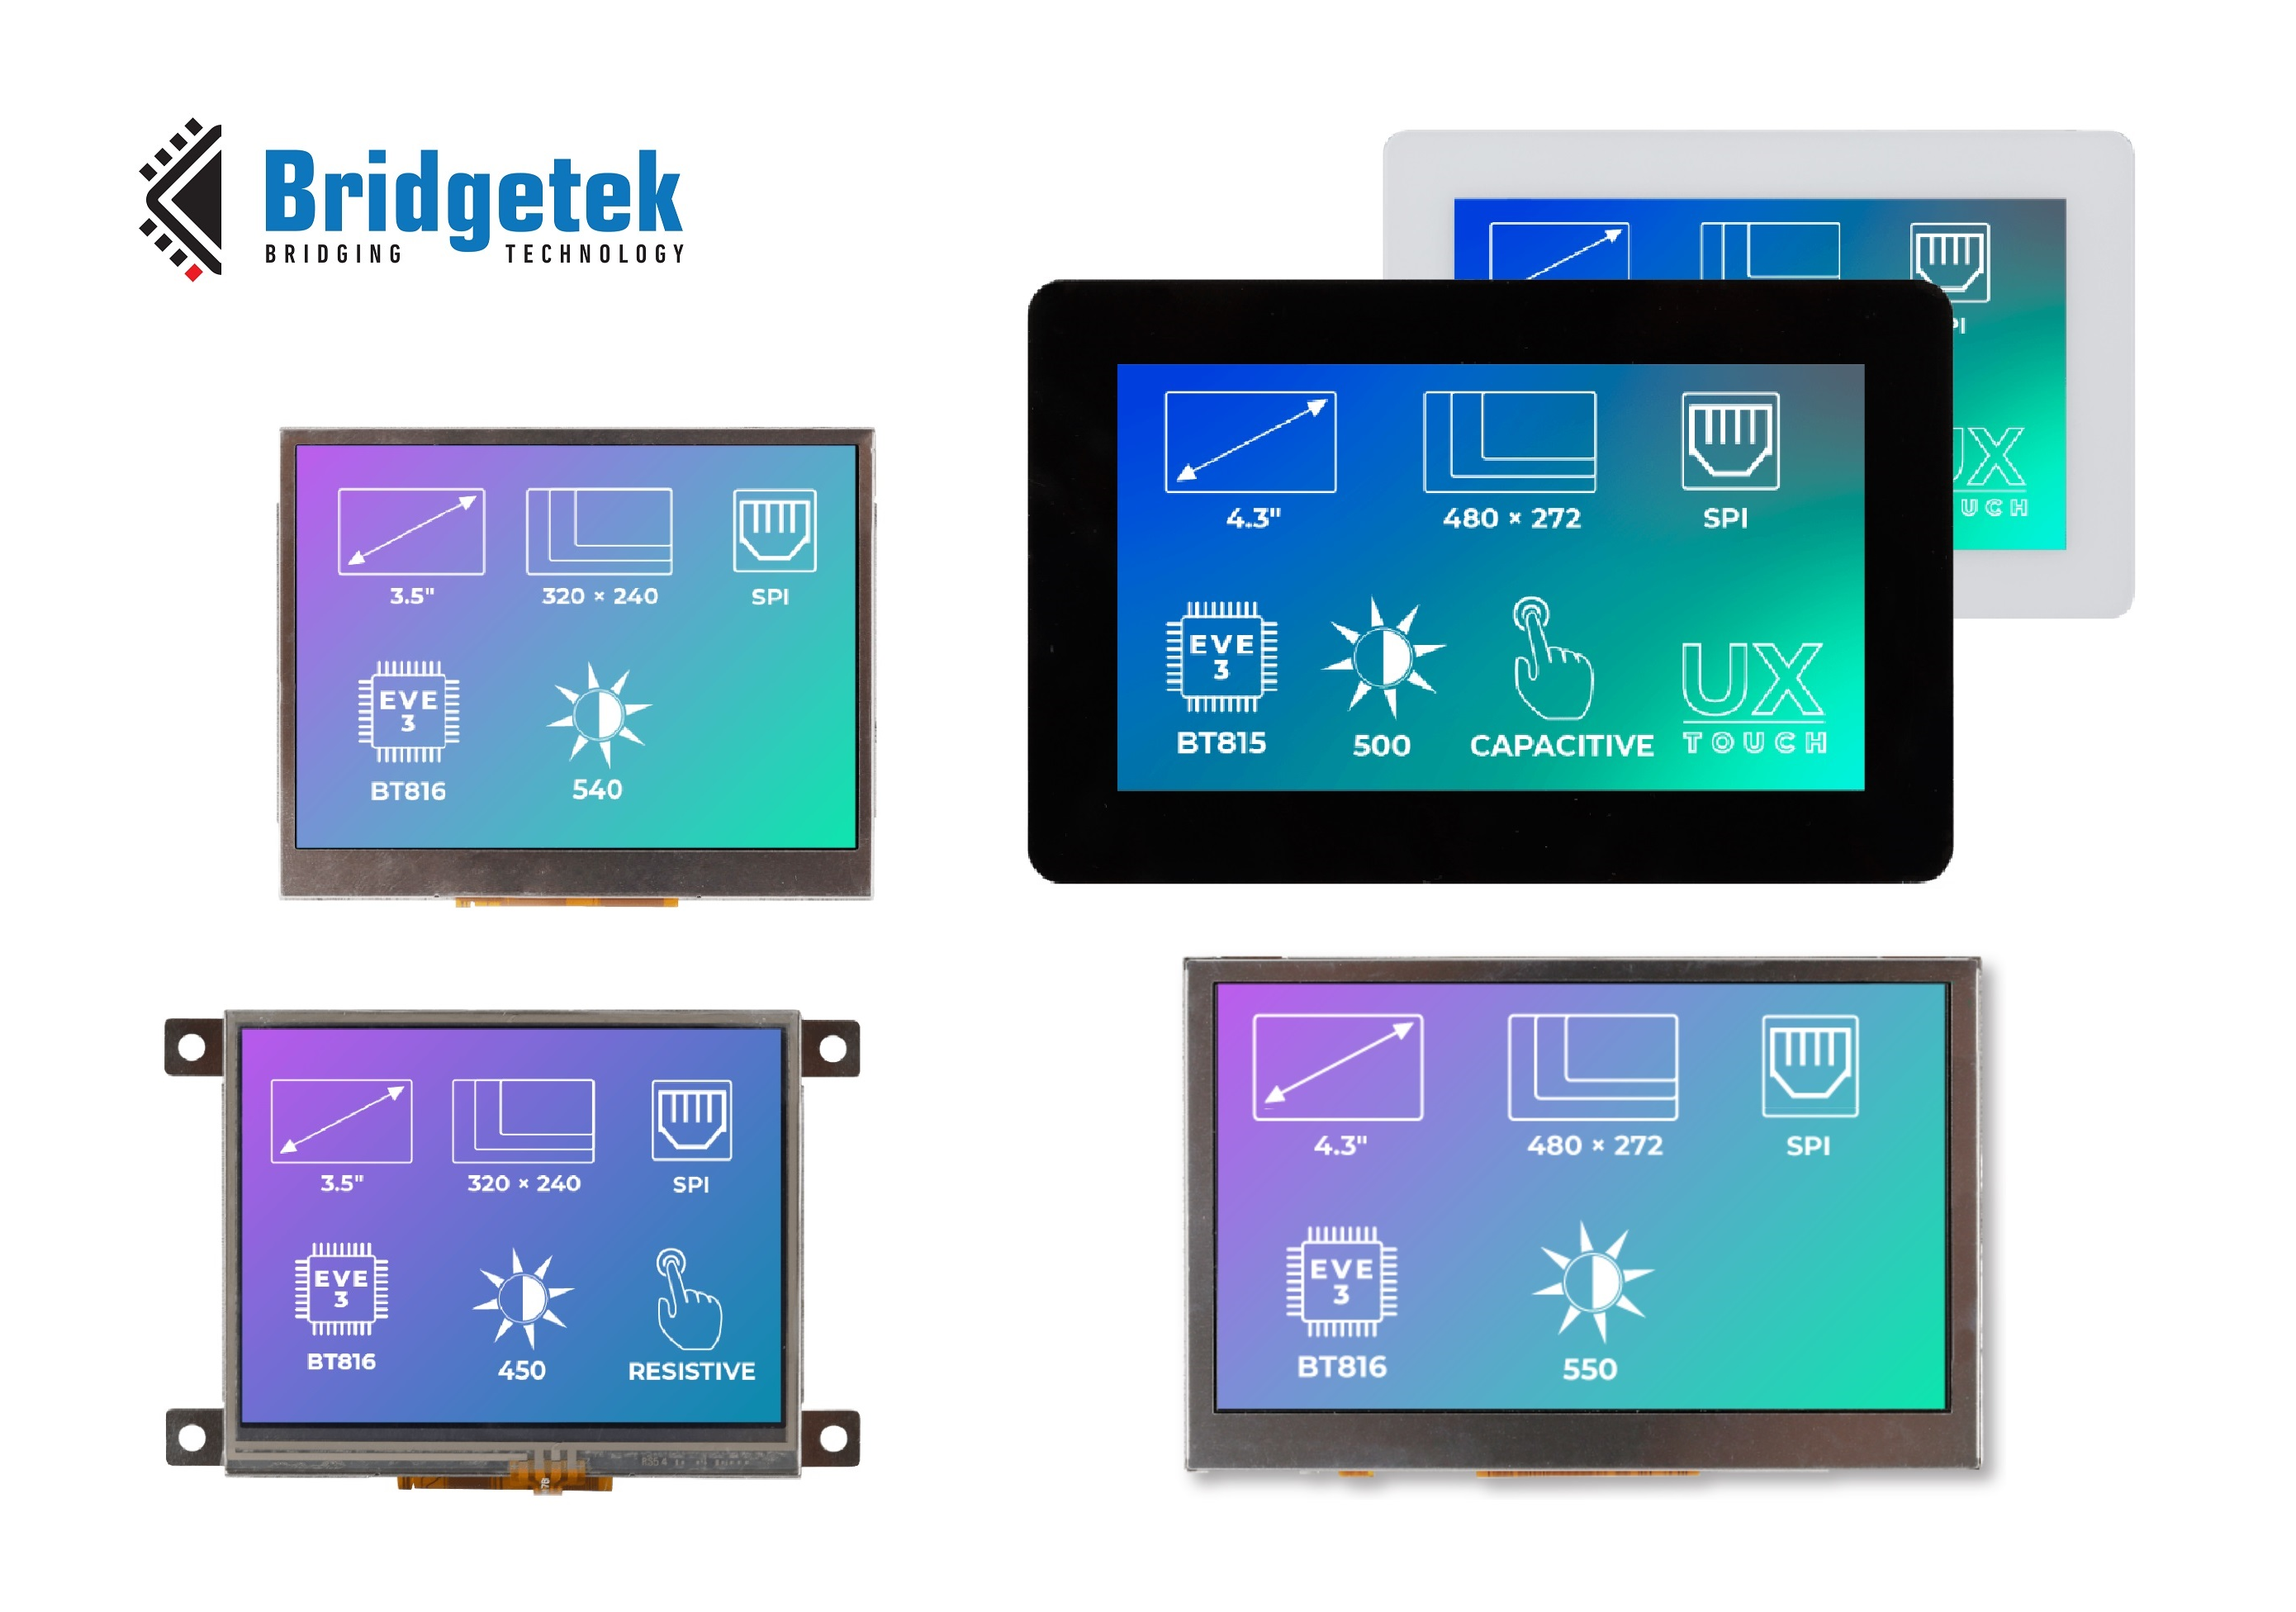 Bridgetek Joins forces with Zerynth & Riverdi to forge IoT Technology Partnership